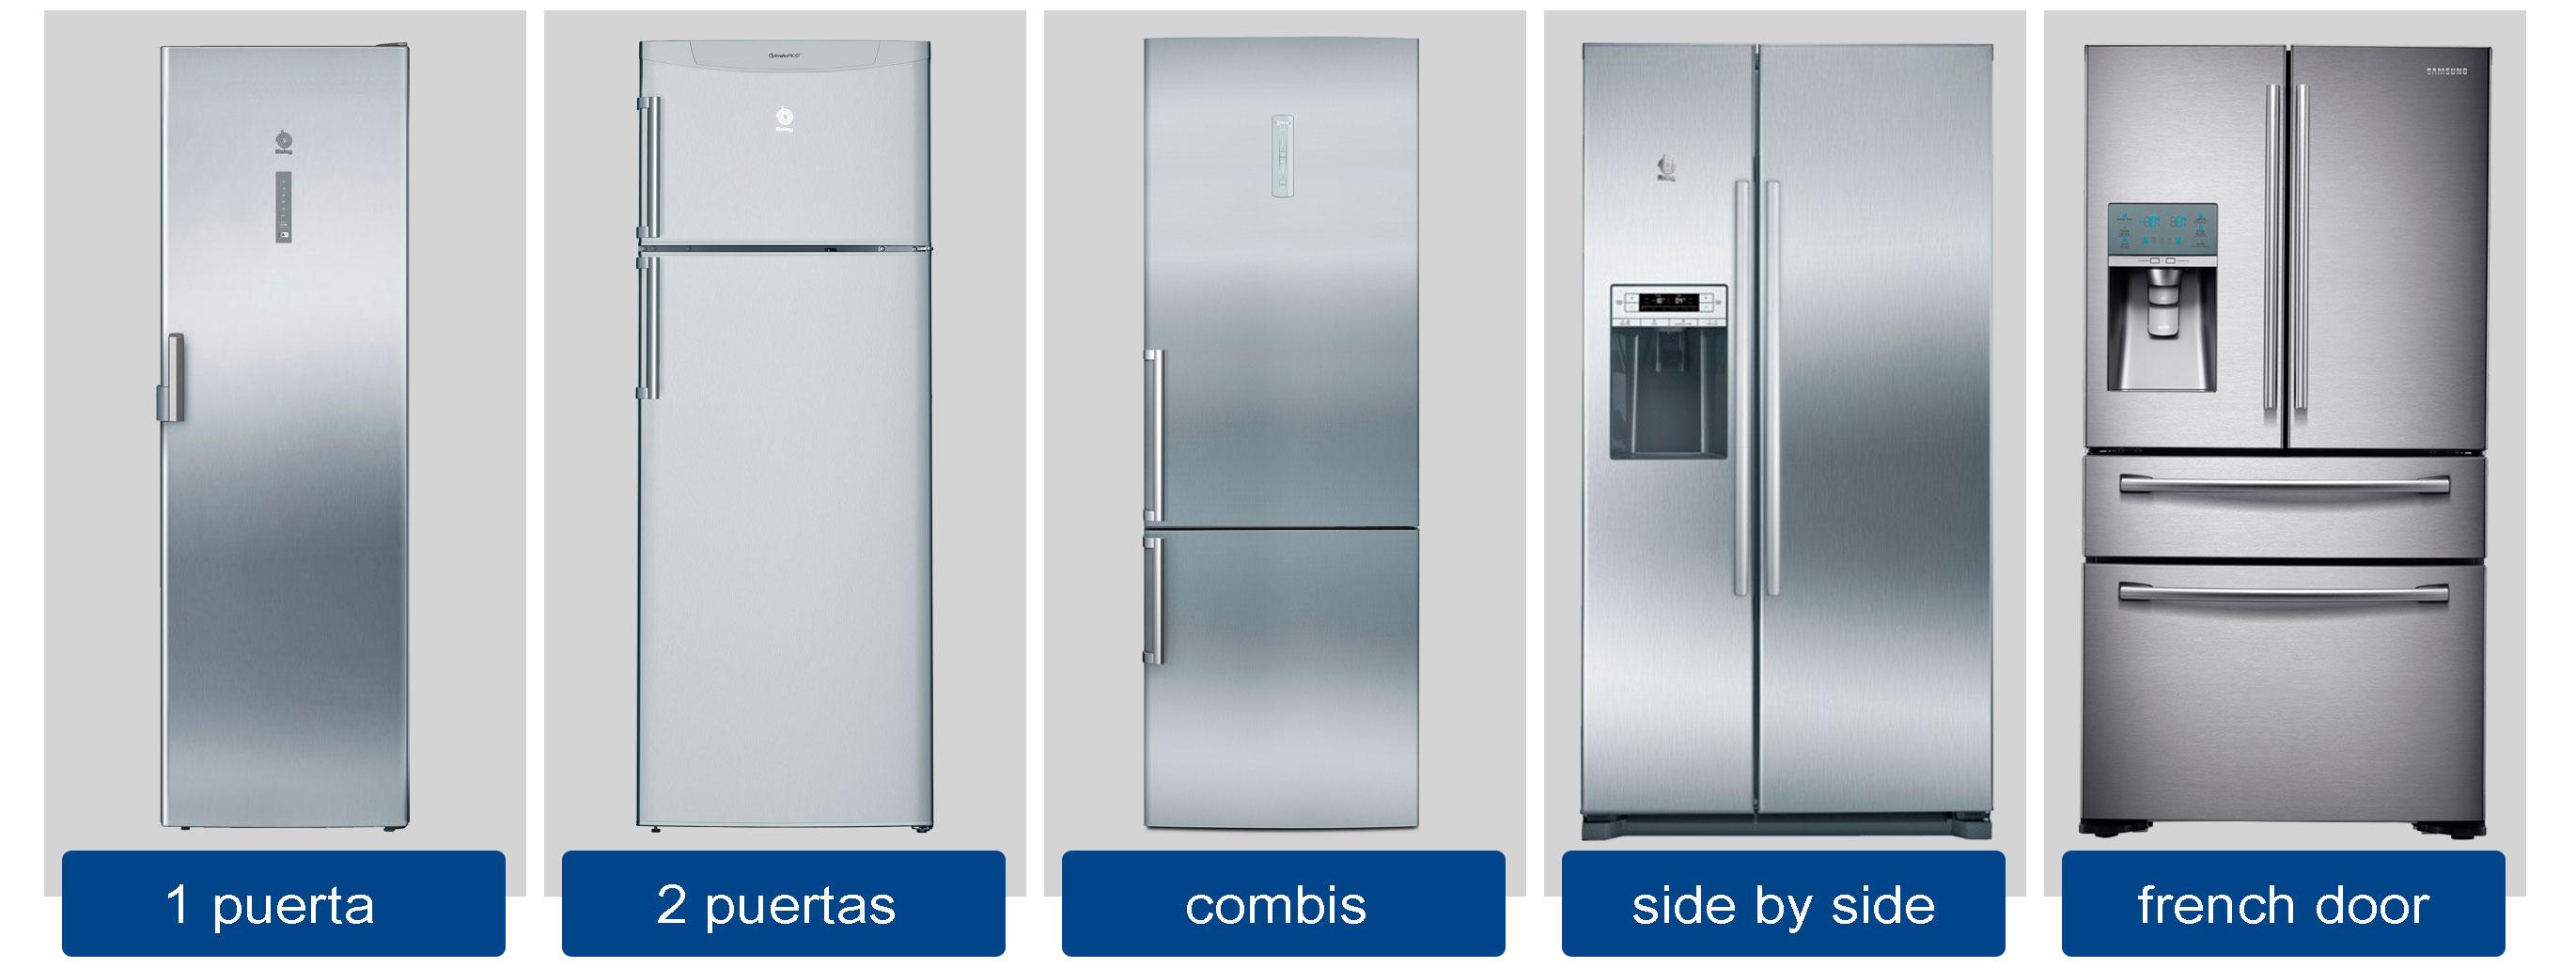 Tipos de frigoríficos Electro Premium